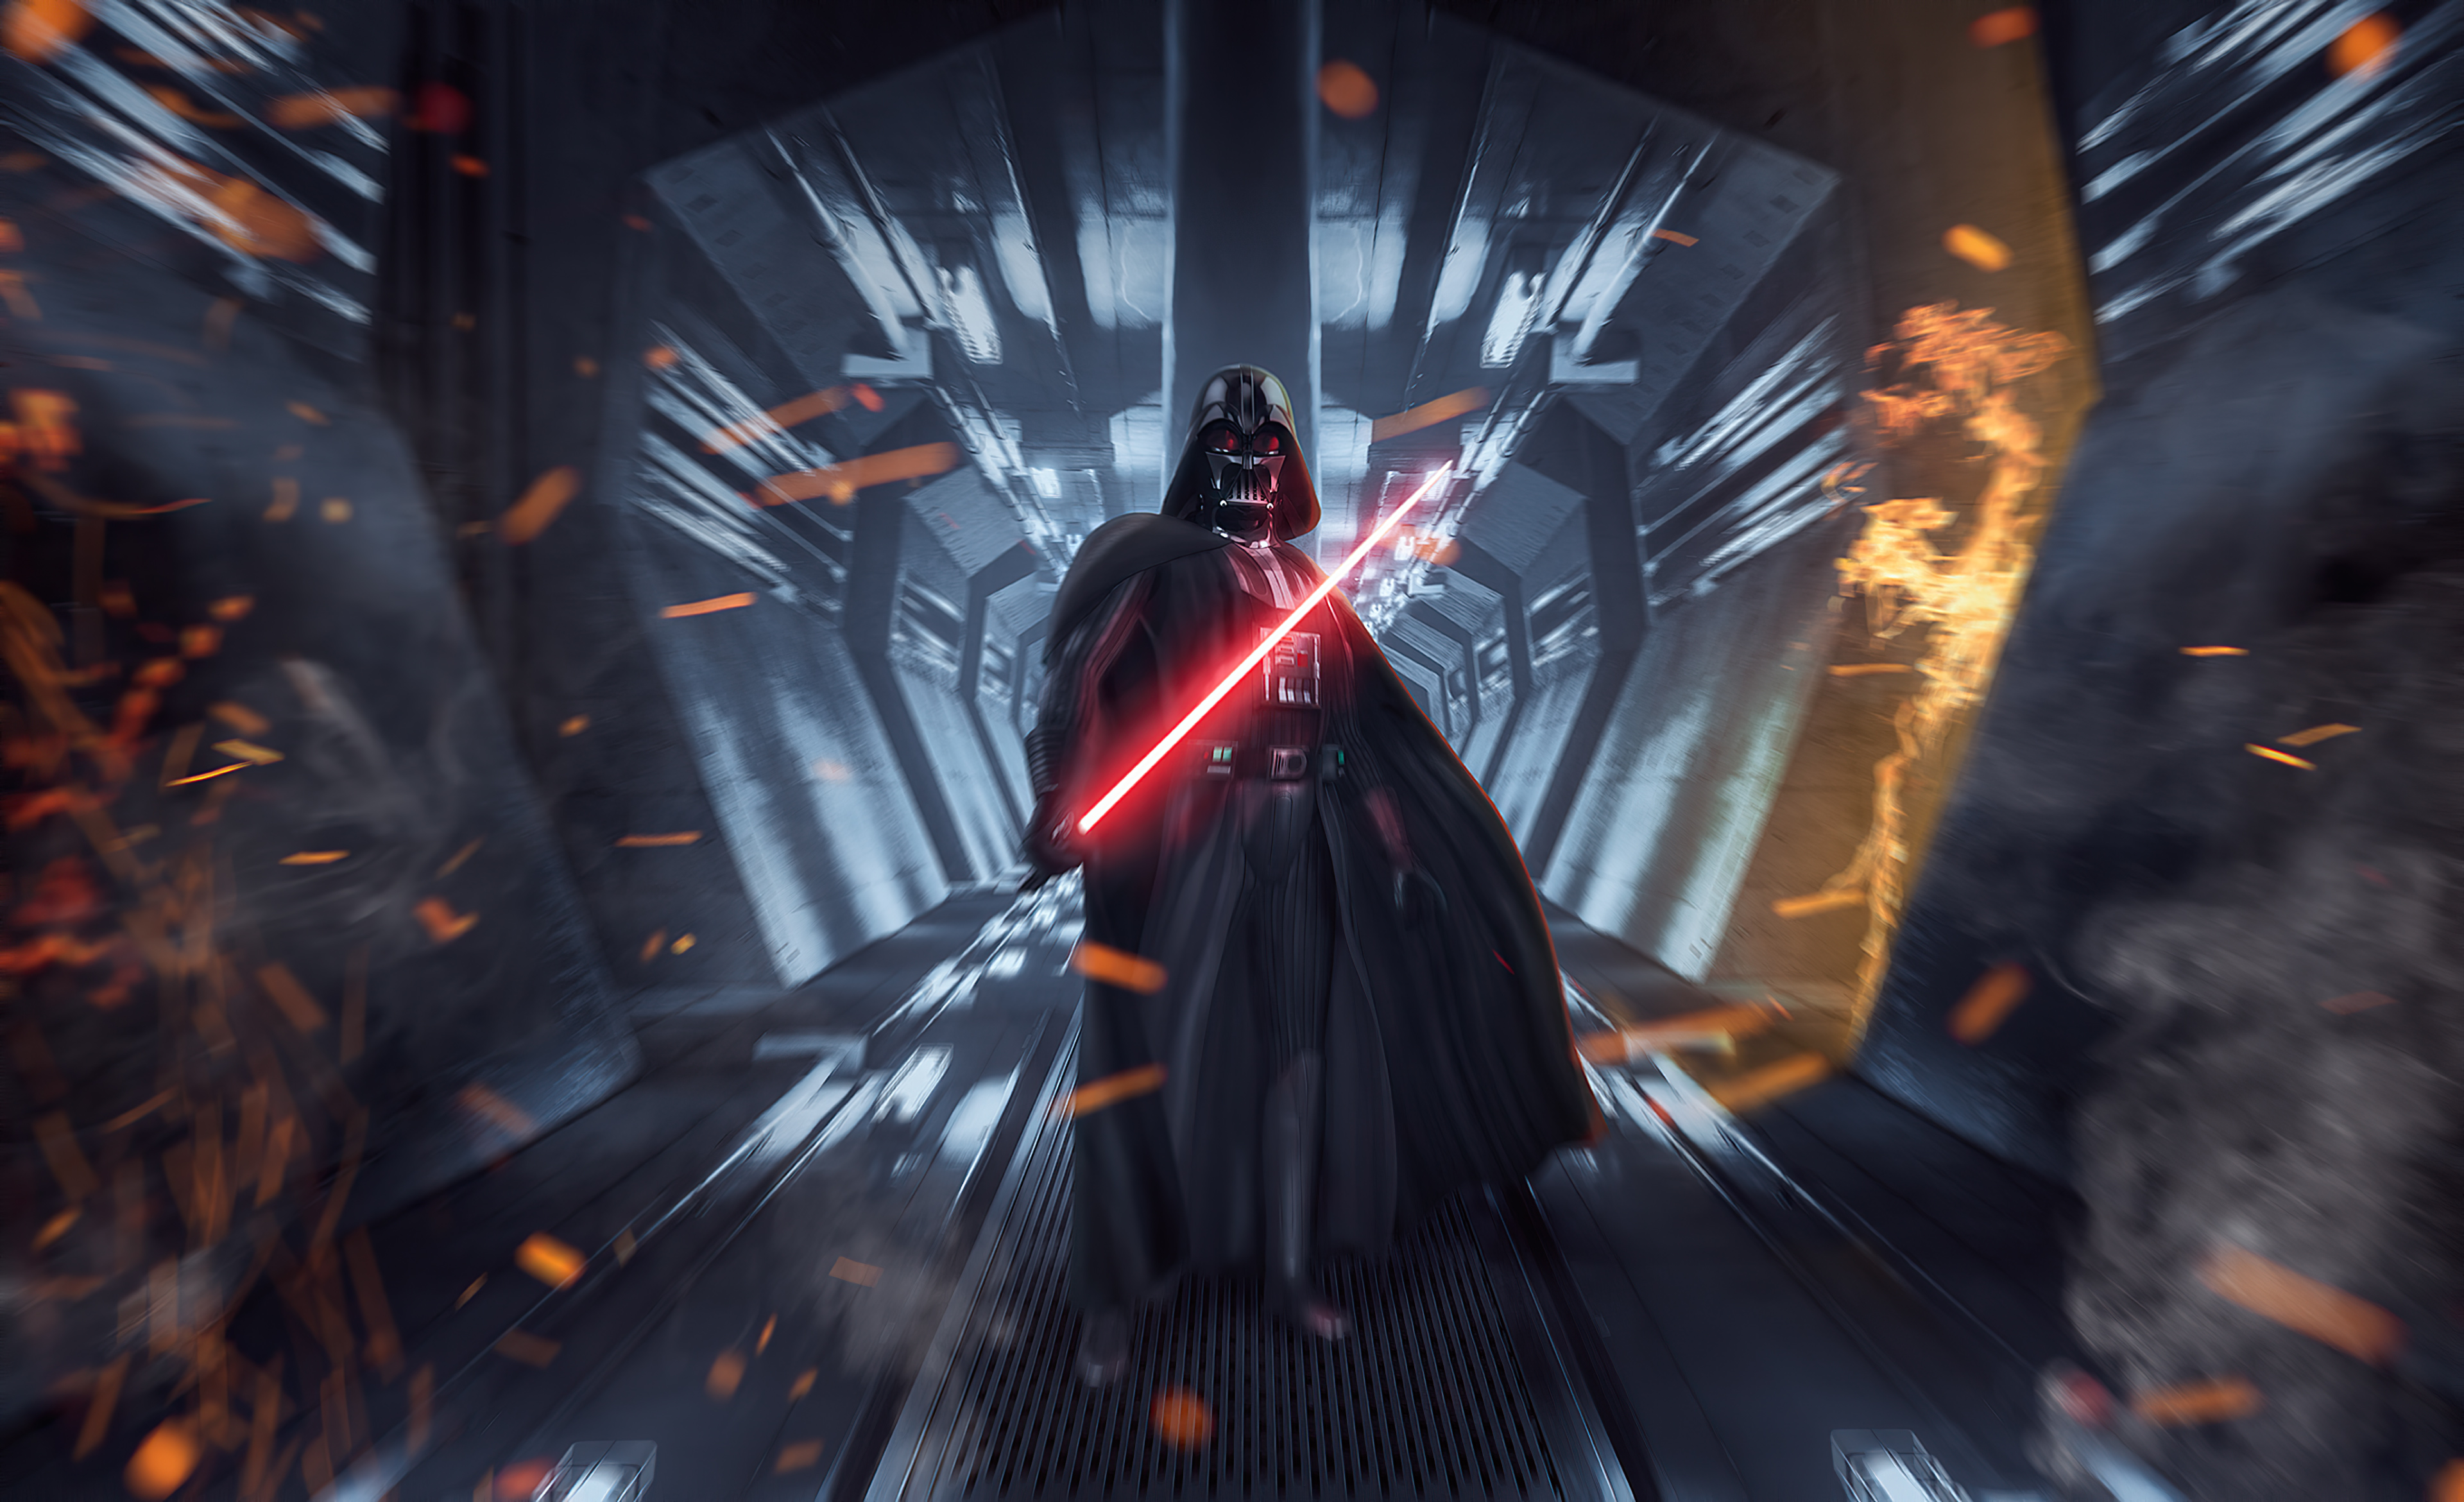 Sci Fi Star Wars 4k Ultra Hd Wallpaper Background Image 3840x2340